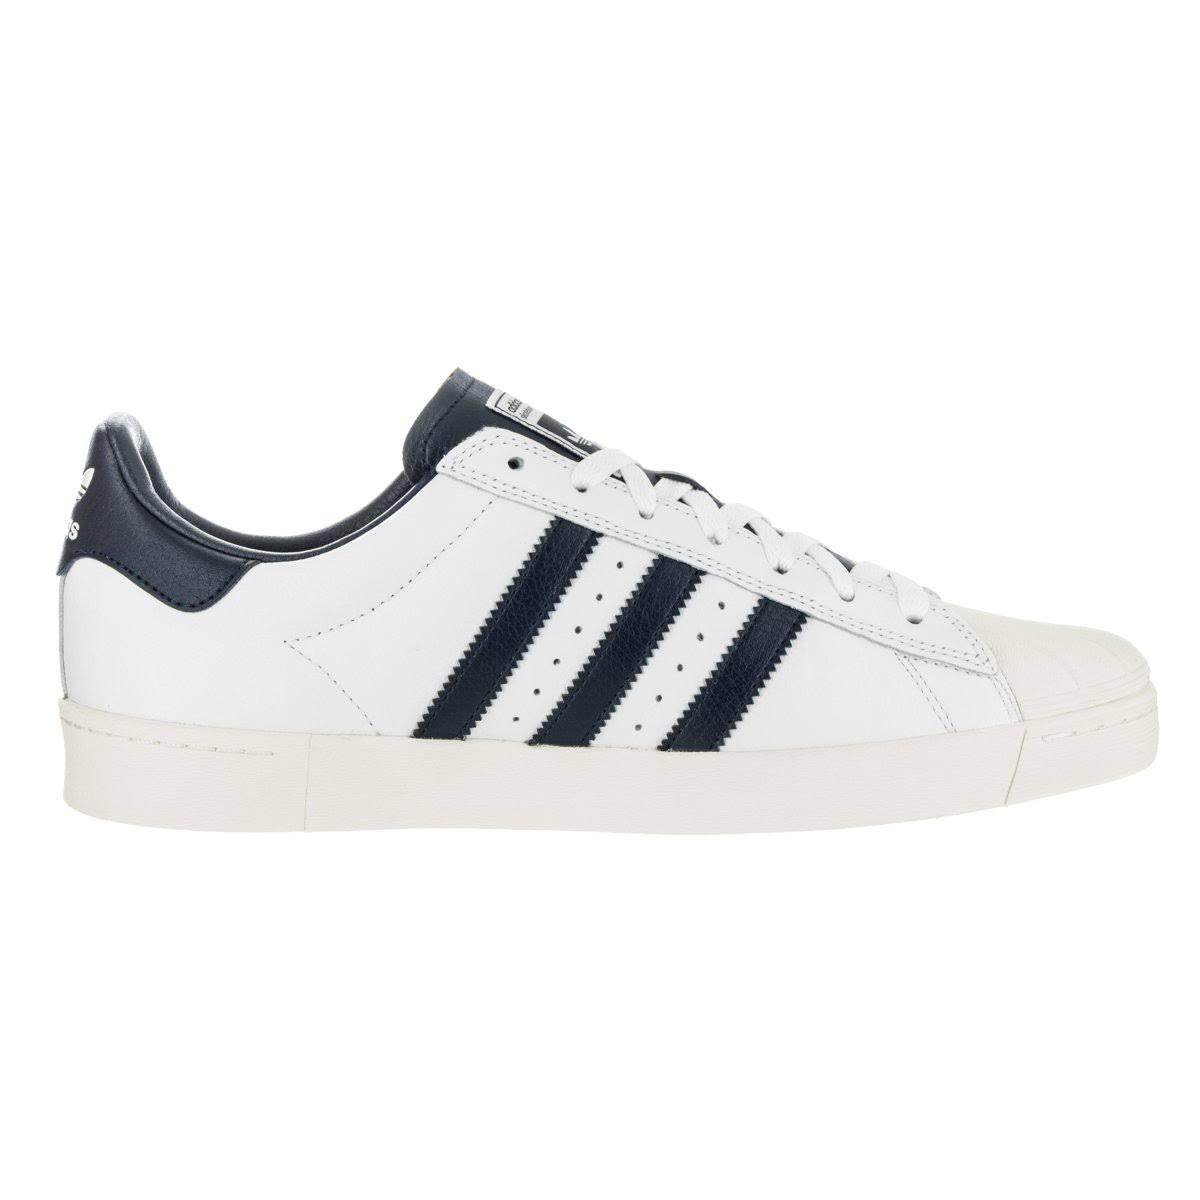 Shoe Men's Adv Vulc Ftwwht conavy Adidas ftwwht Superstar Skate qXvznwA